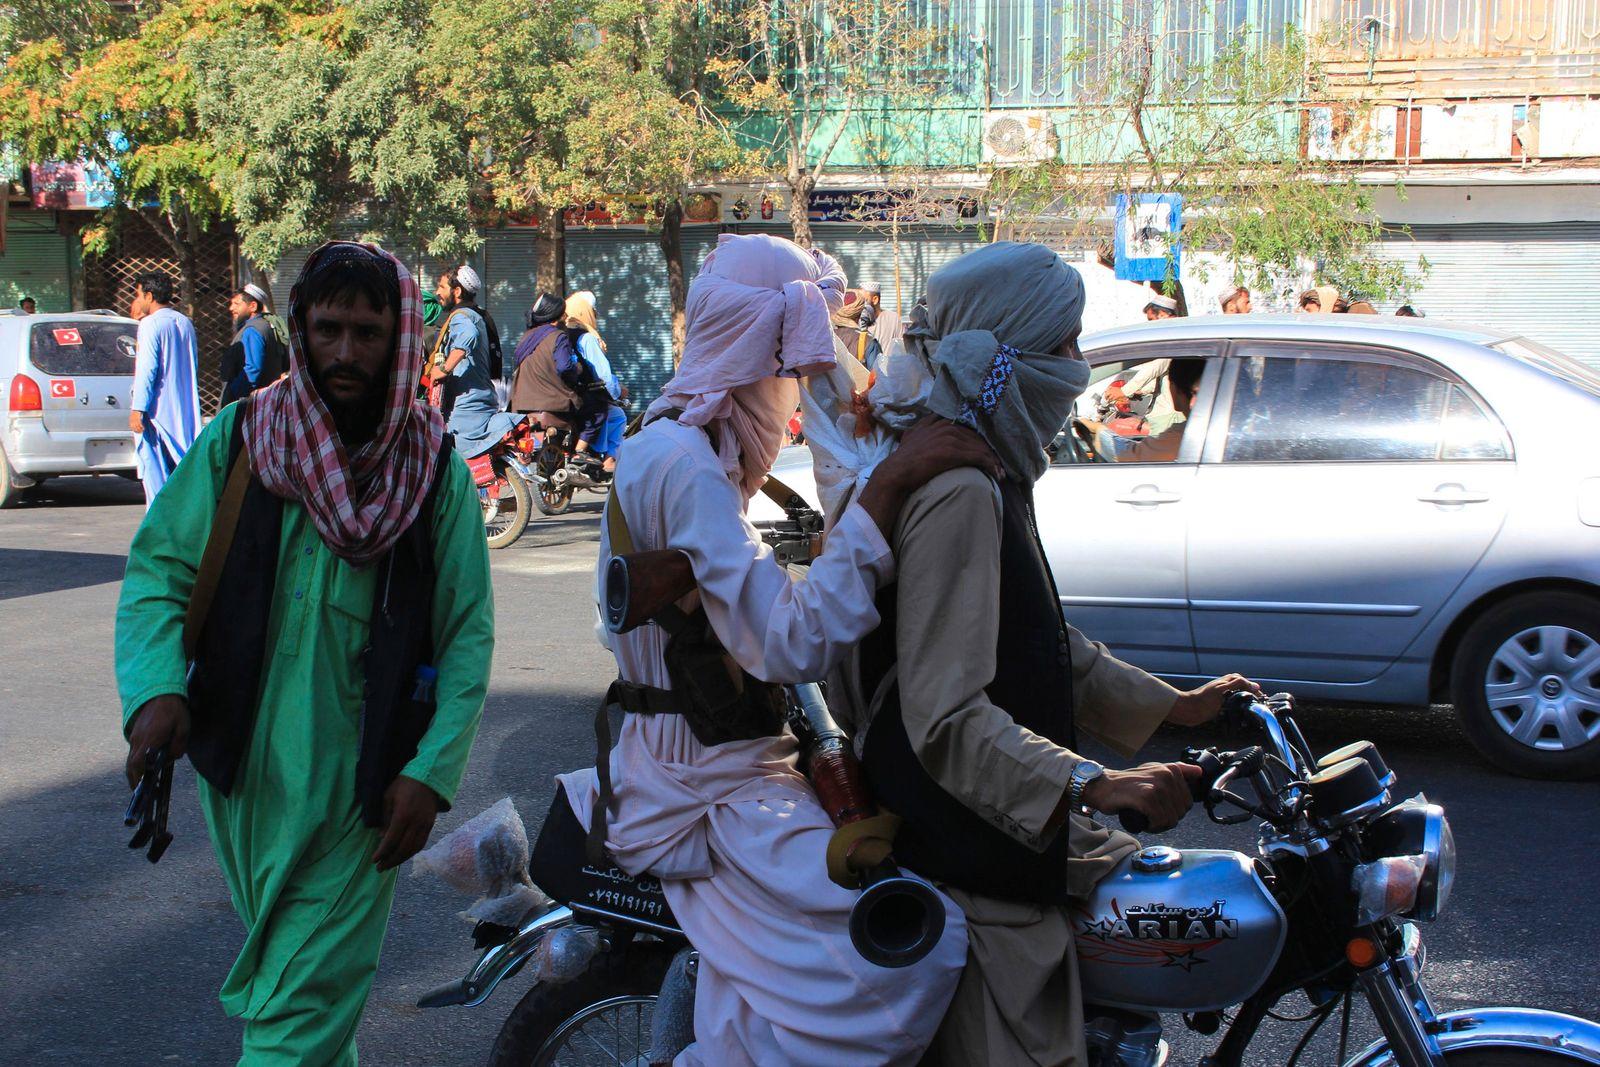 Konflikt in Afghanistan